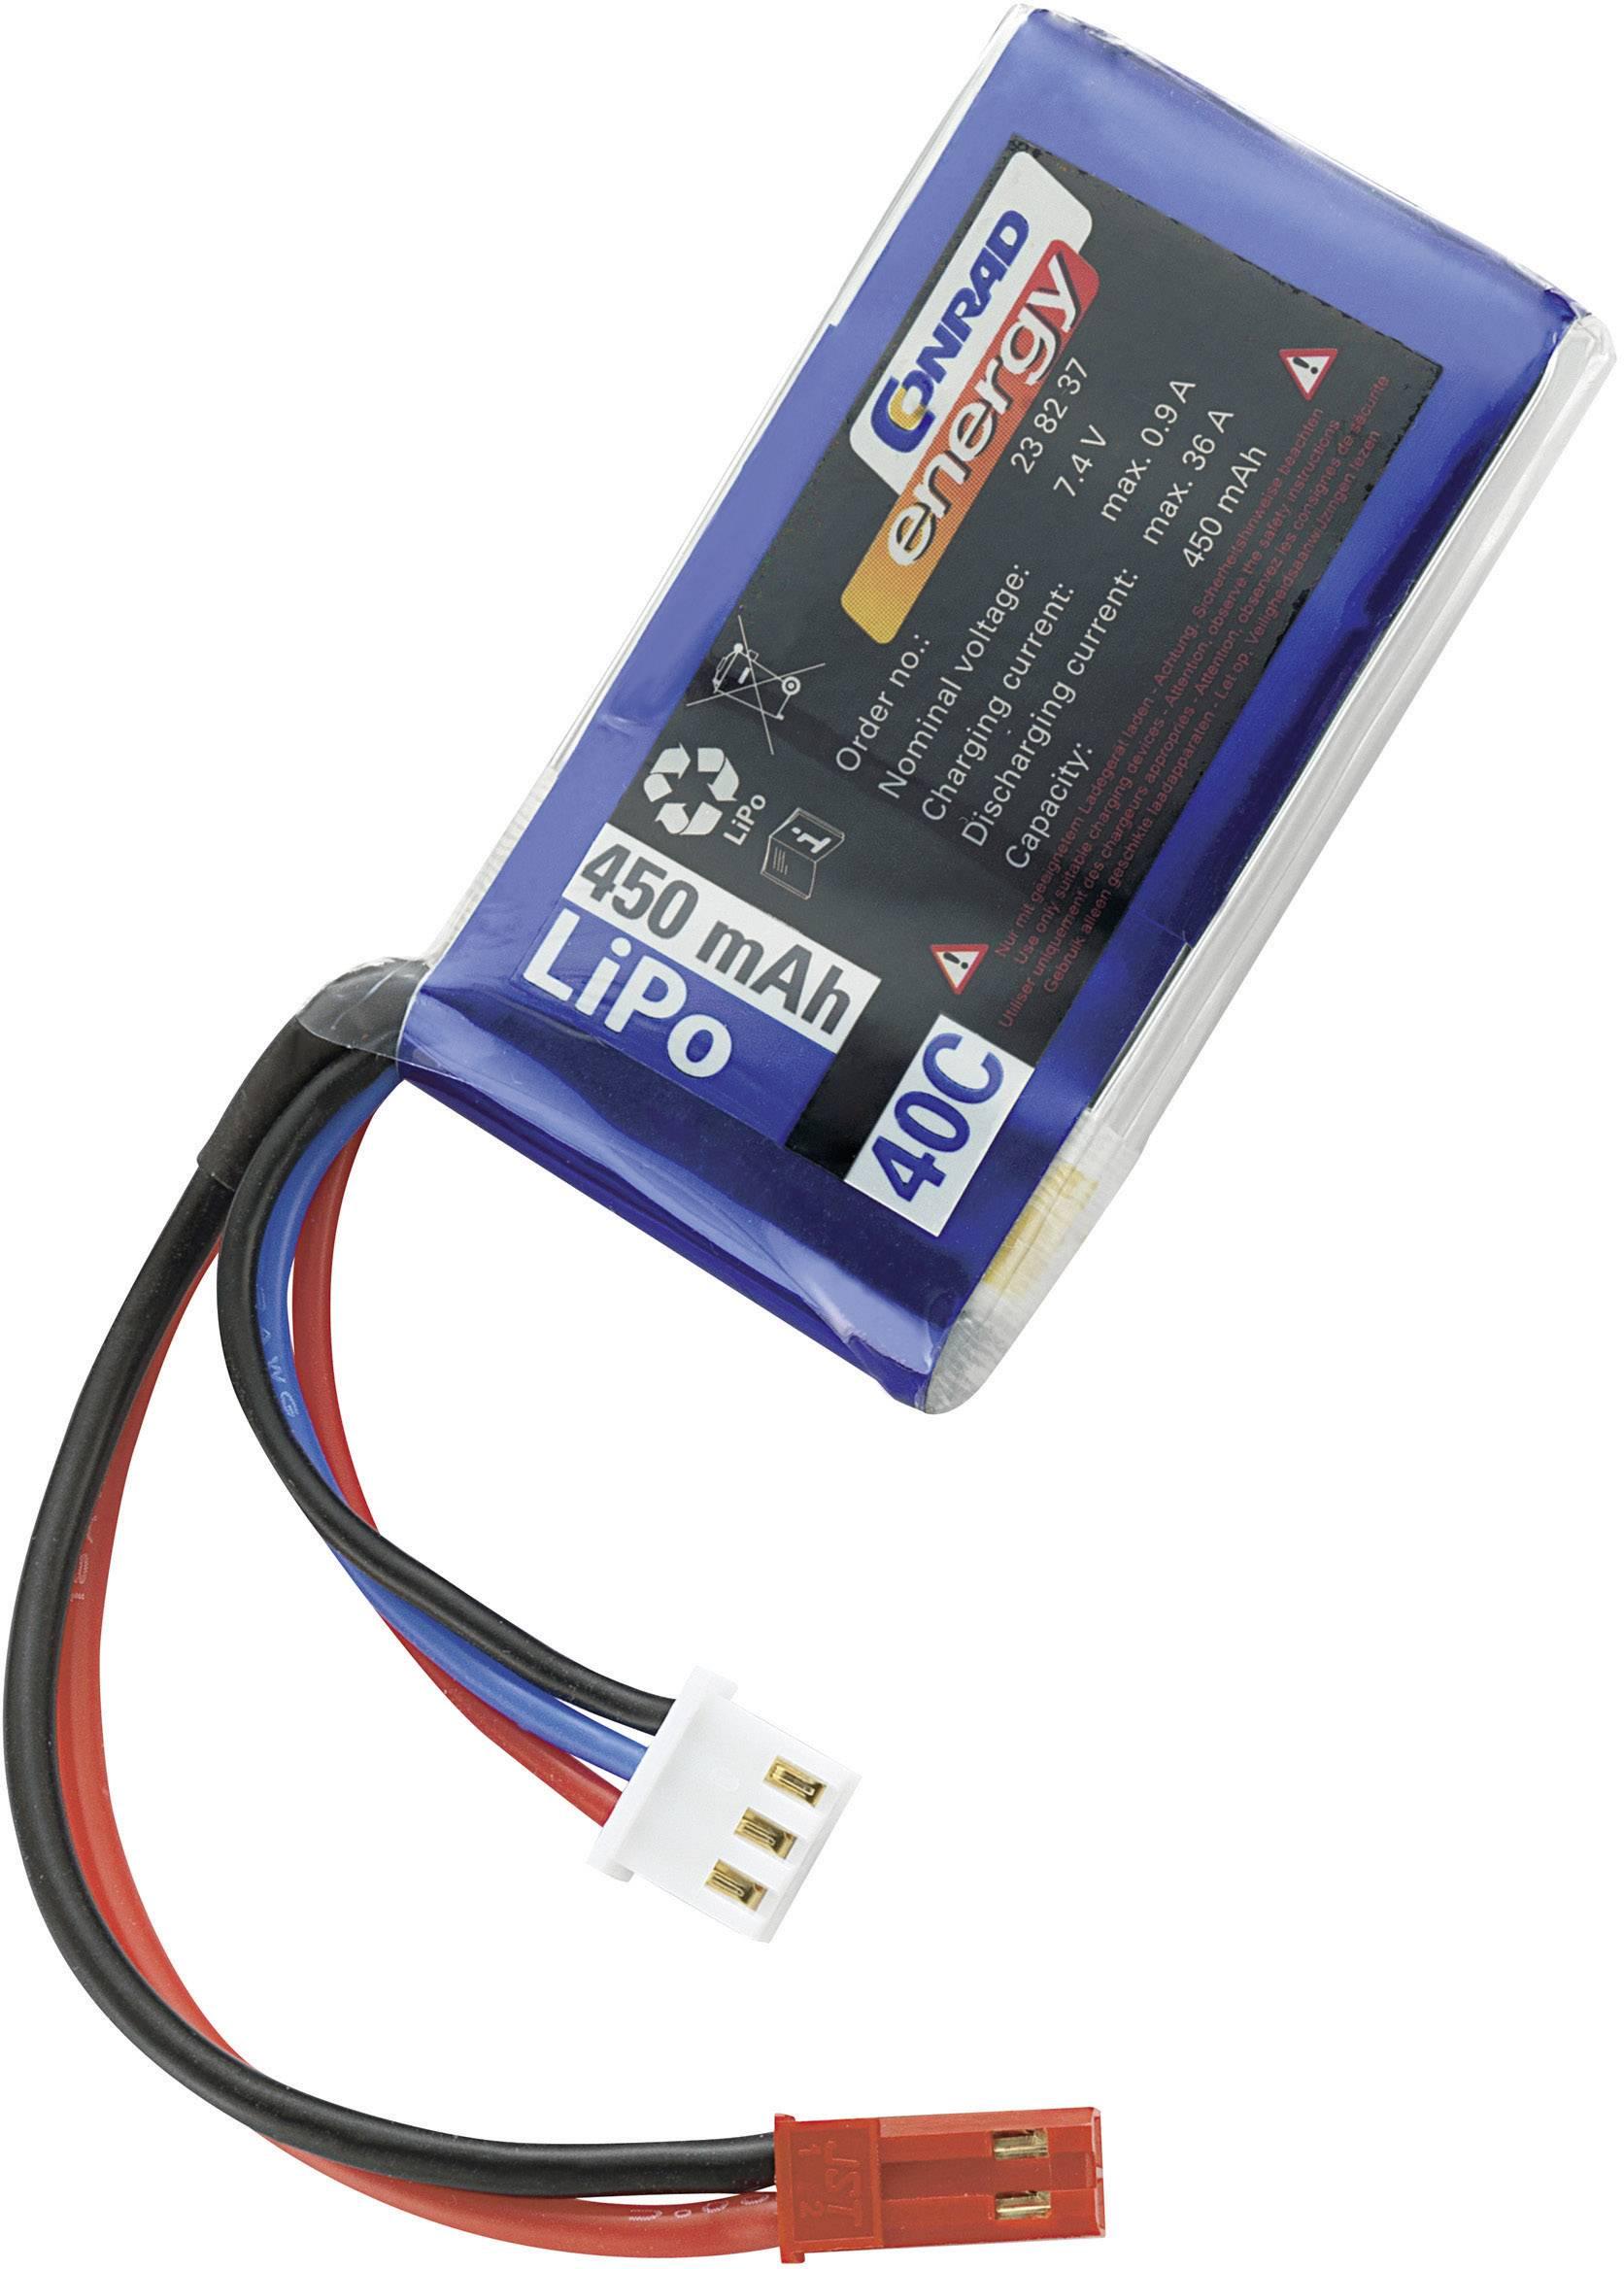 Akupack Li-Pol Conrad energy 238237, 7.4 V, 450 mAh